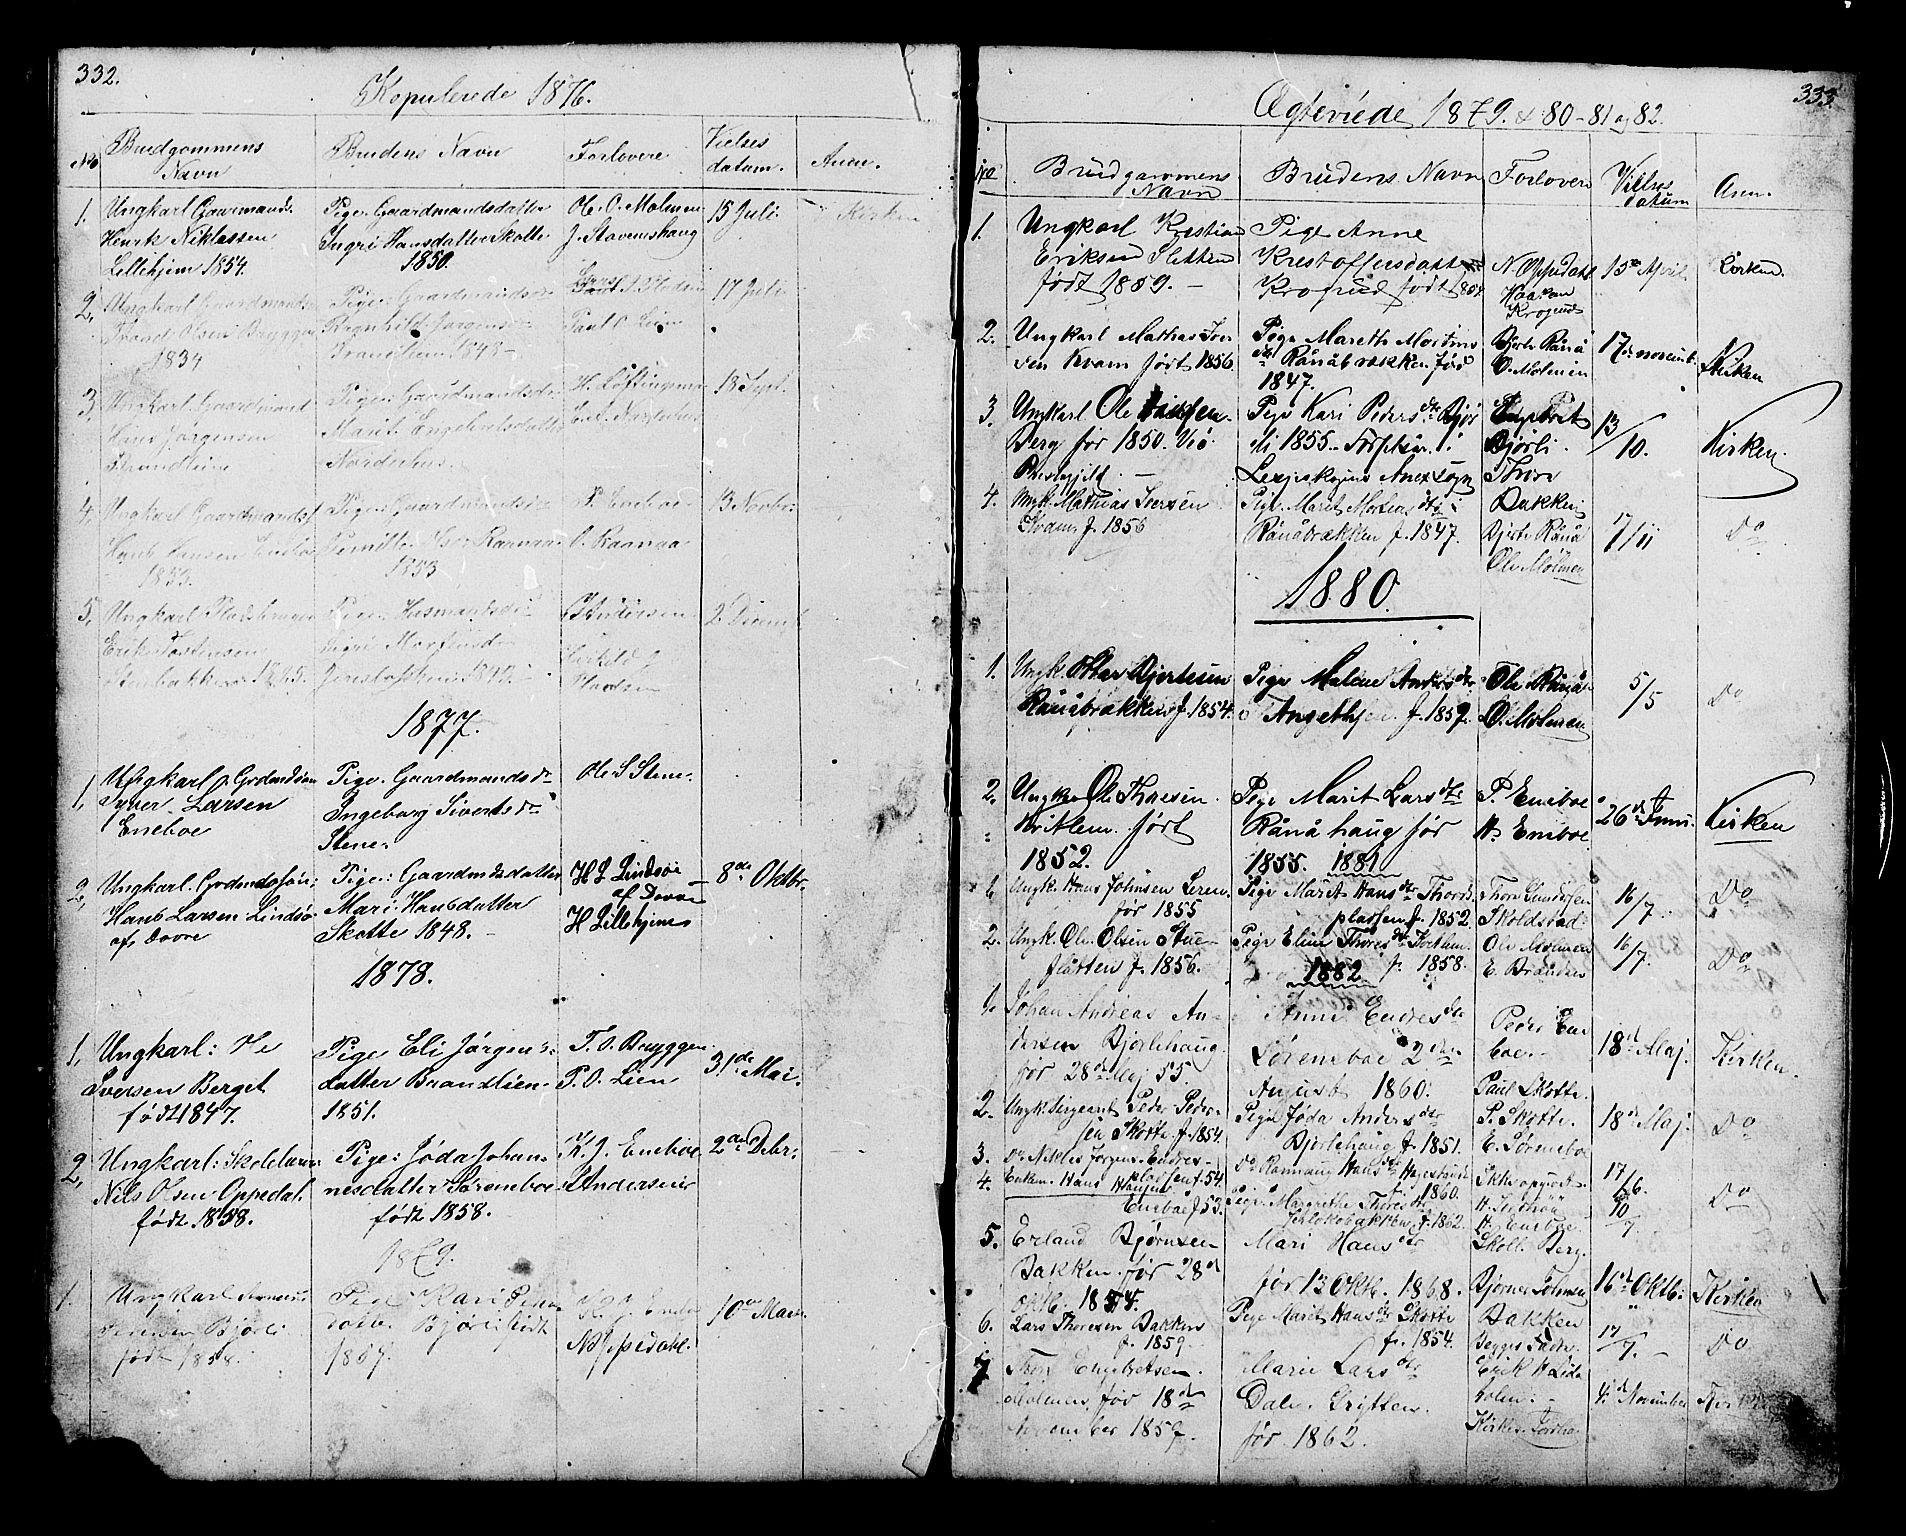 SAH, Lesja prestekontor, Klokkerbok nr. 6, 1871-1904, s. 332-333